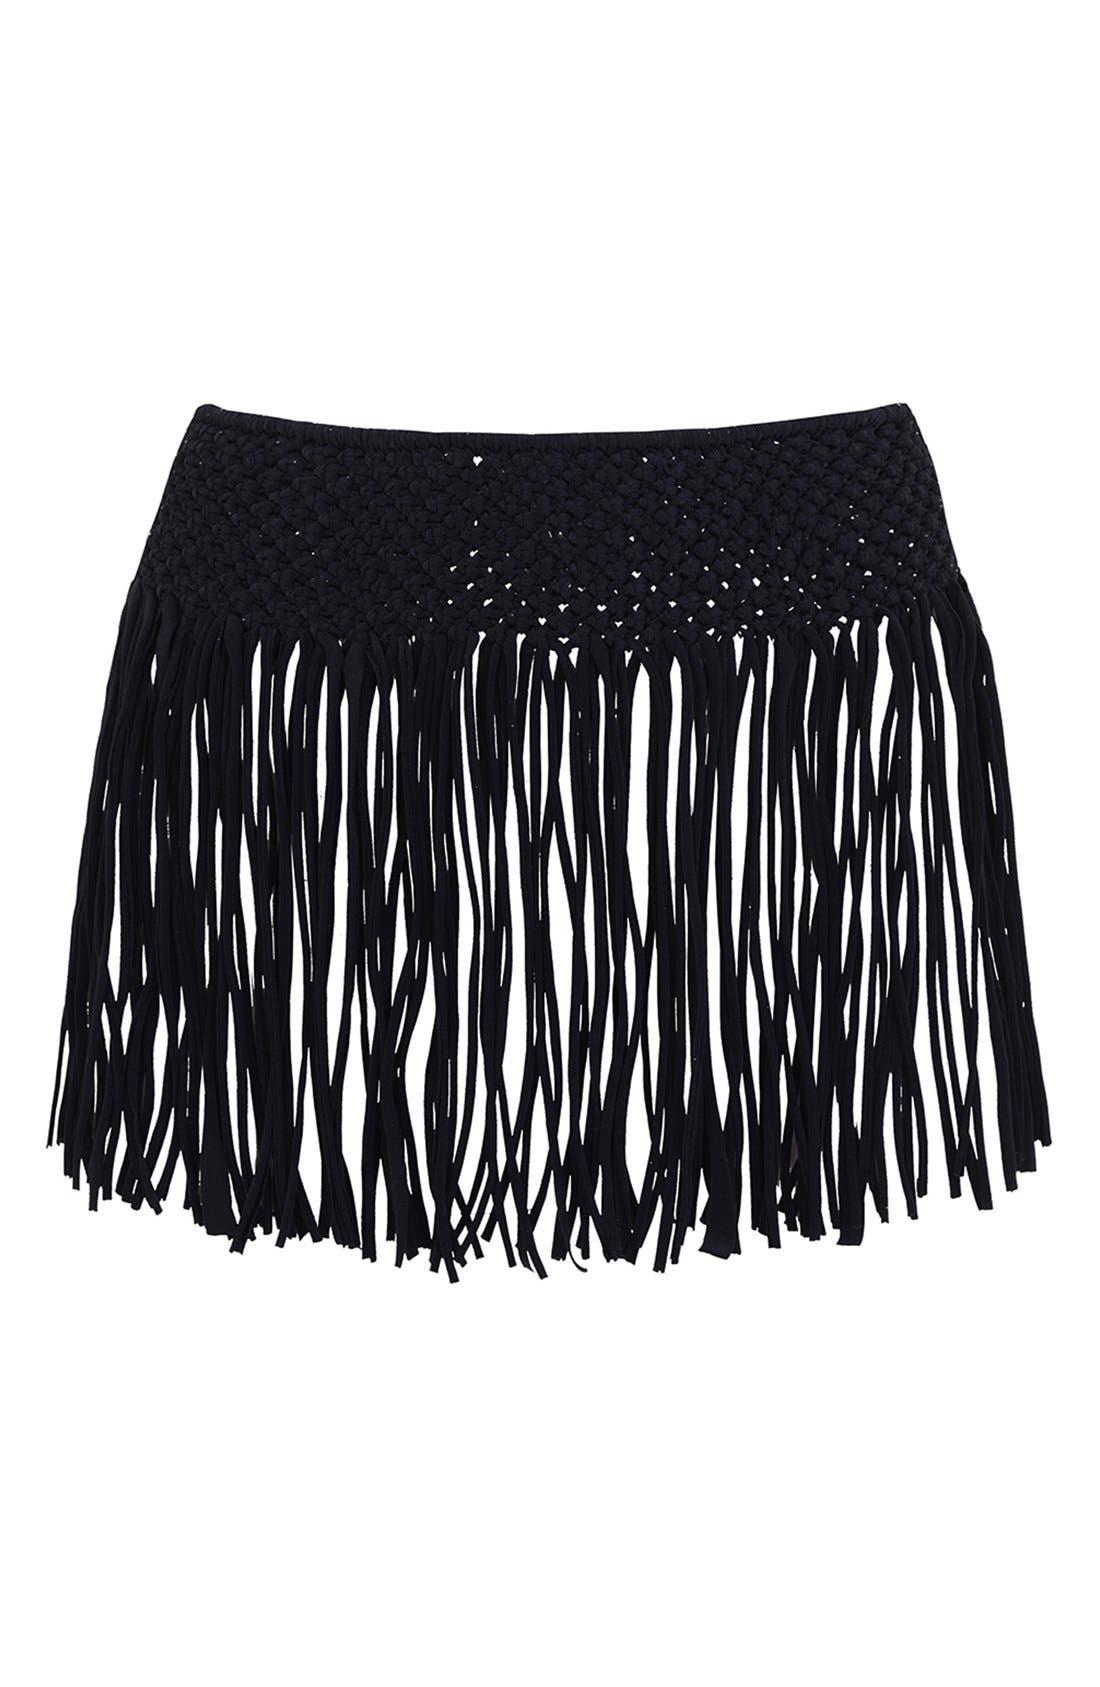 Main Image - KENDALL + KYLIE at Topshop Macramé Fringe Cover-Up Skirt